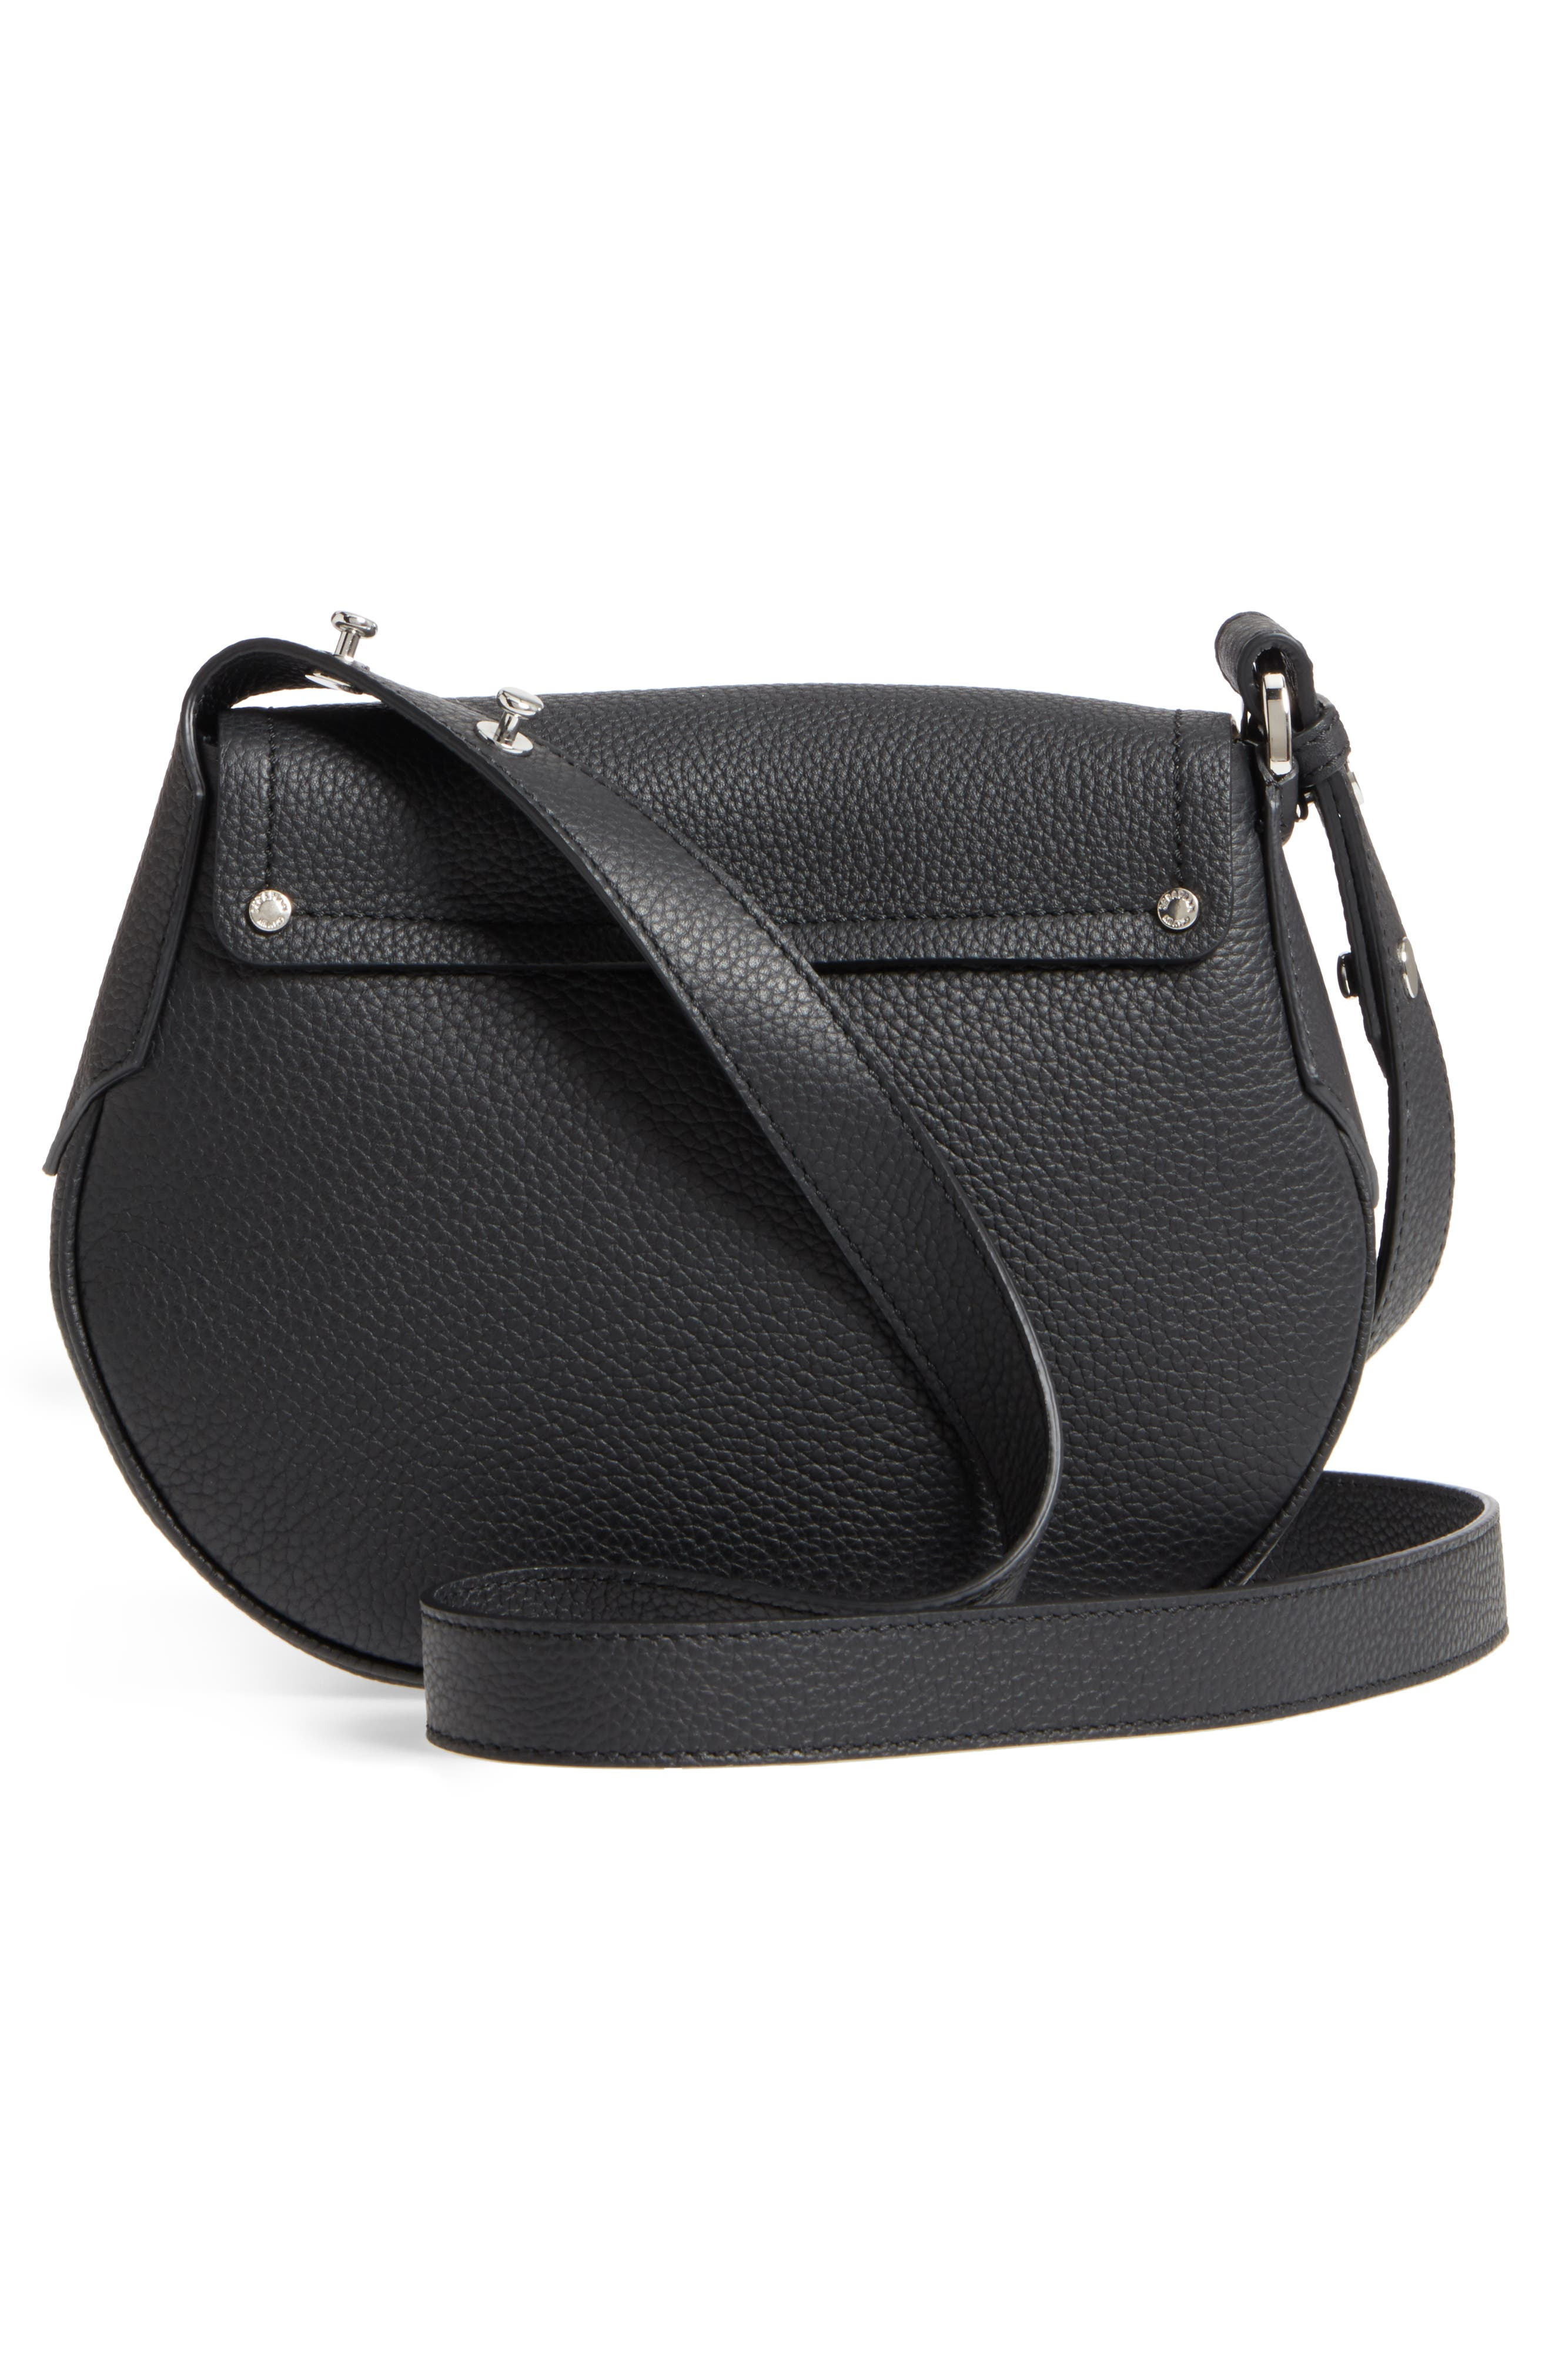 Mini Valeria Cachemire Leather Crossbody Bag,                             Alternate thumbnail 3, color,                             001